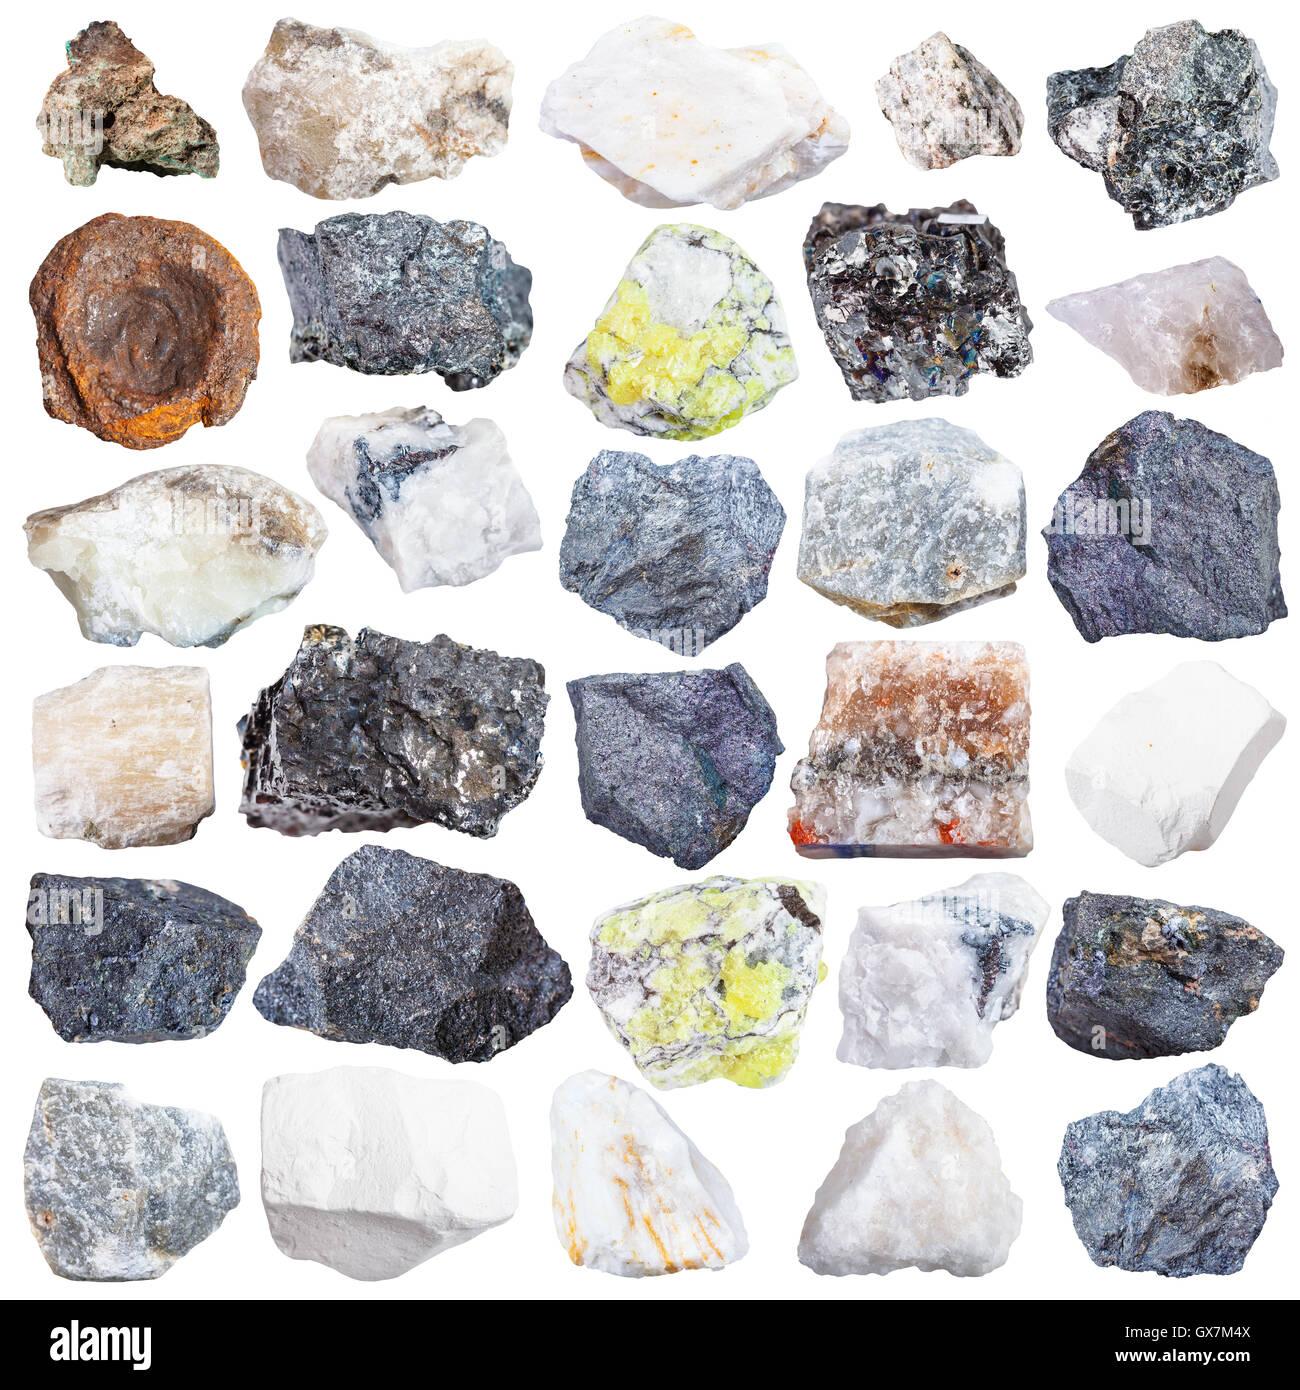 set of natural mineral specimens - apatite, gypsum, anhydrite, molybdenite, bornite, halite, chromite, wolframite, - Stock Image